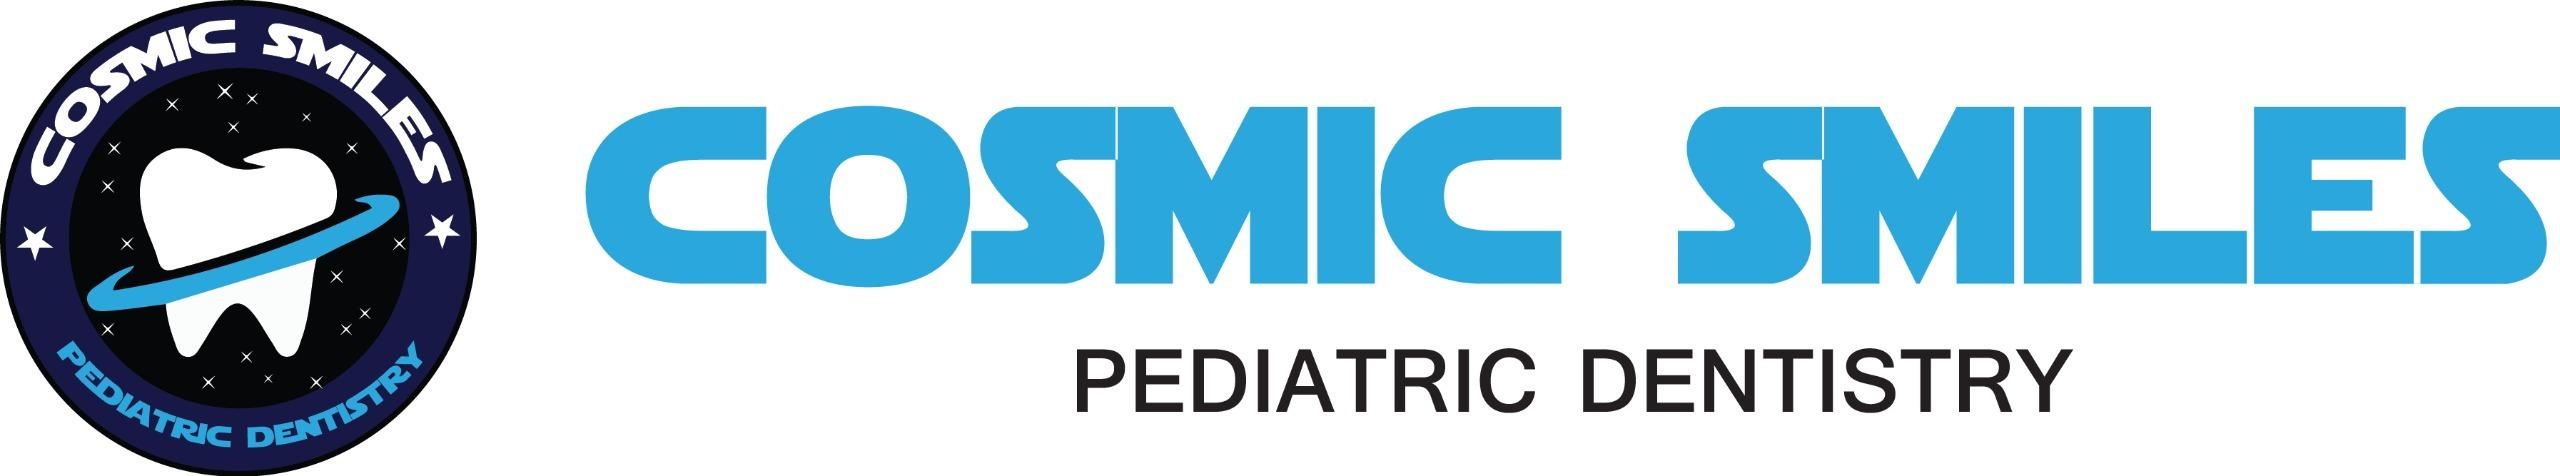 Cosmic Smiles Pediatric Dentistry  (@cosmicsmiles) Cover Image